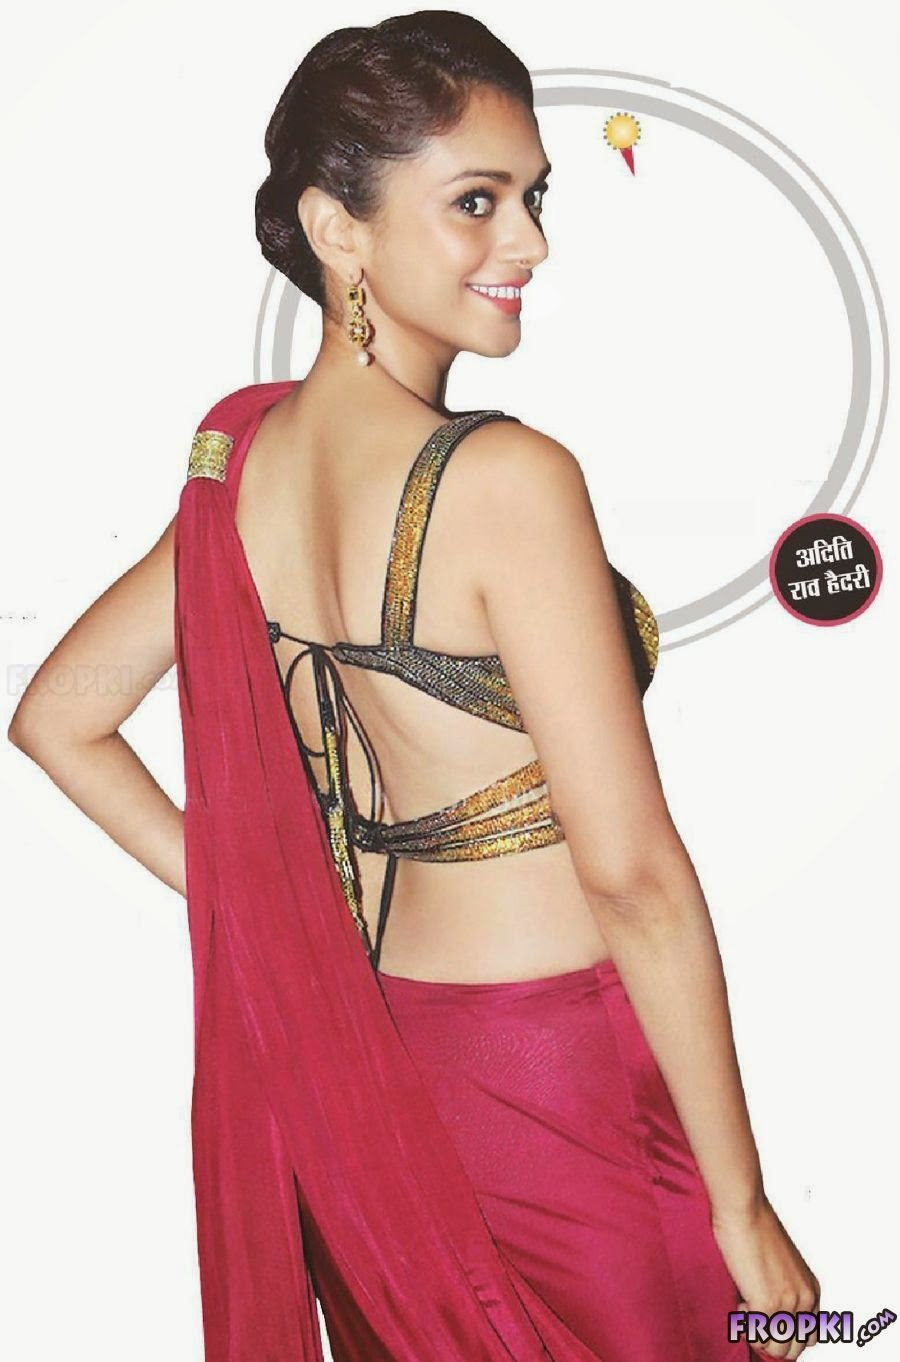 Backless photos of bollywood actress